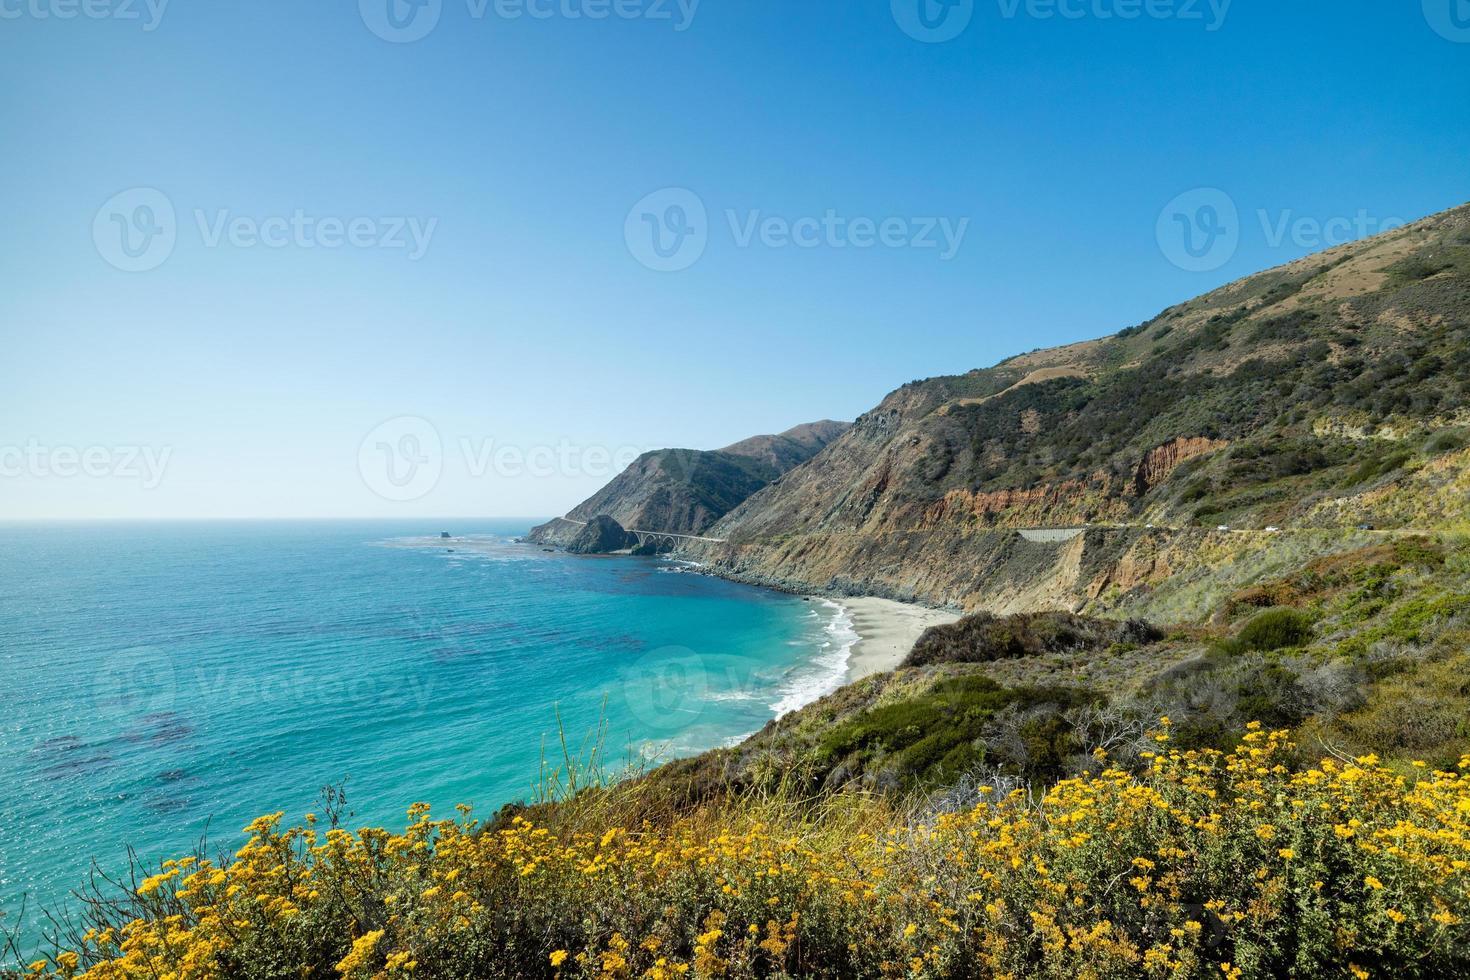 Pacific Coast Highway Route 1 vista panoramica estiva, California foto